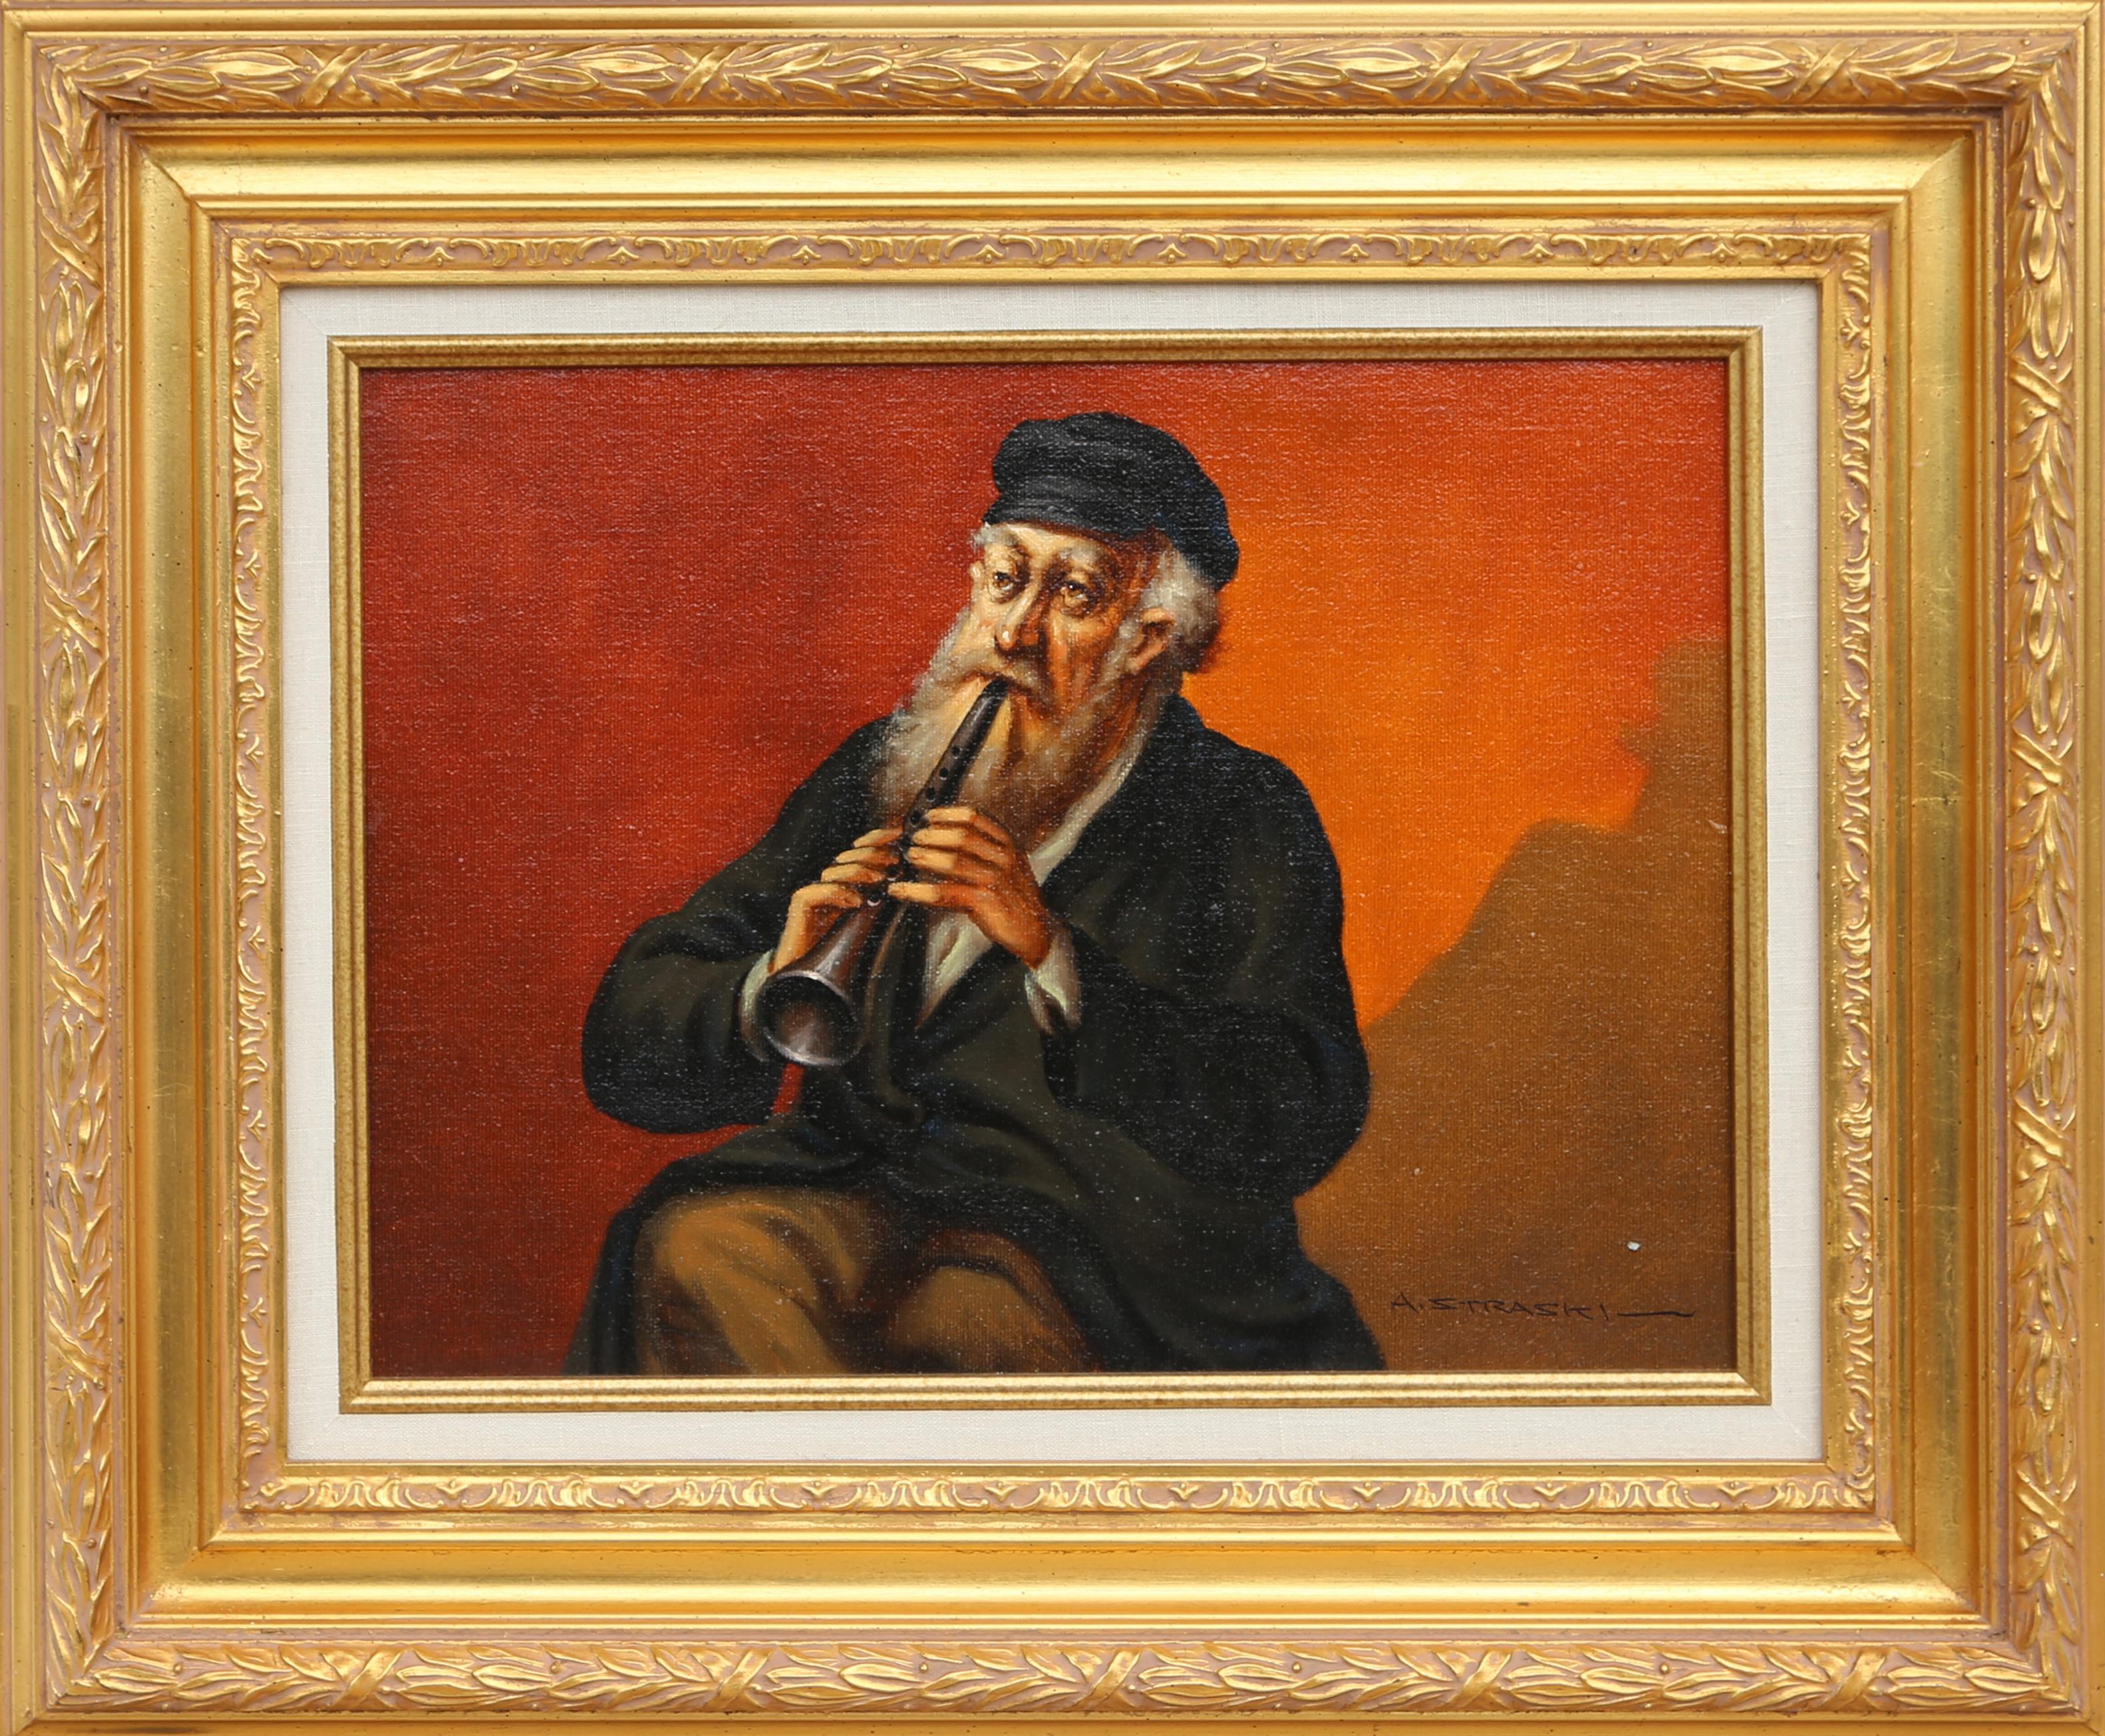 Framed Clarinet Player, Oil Painting by Abraham Straski